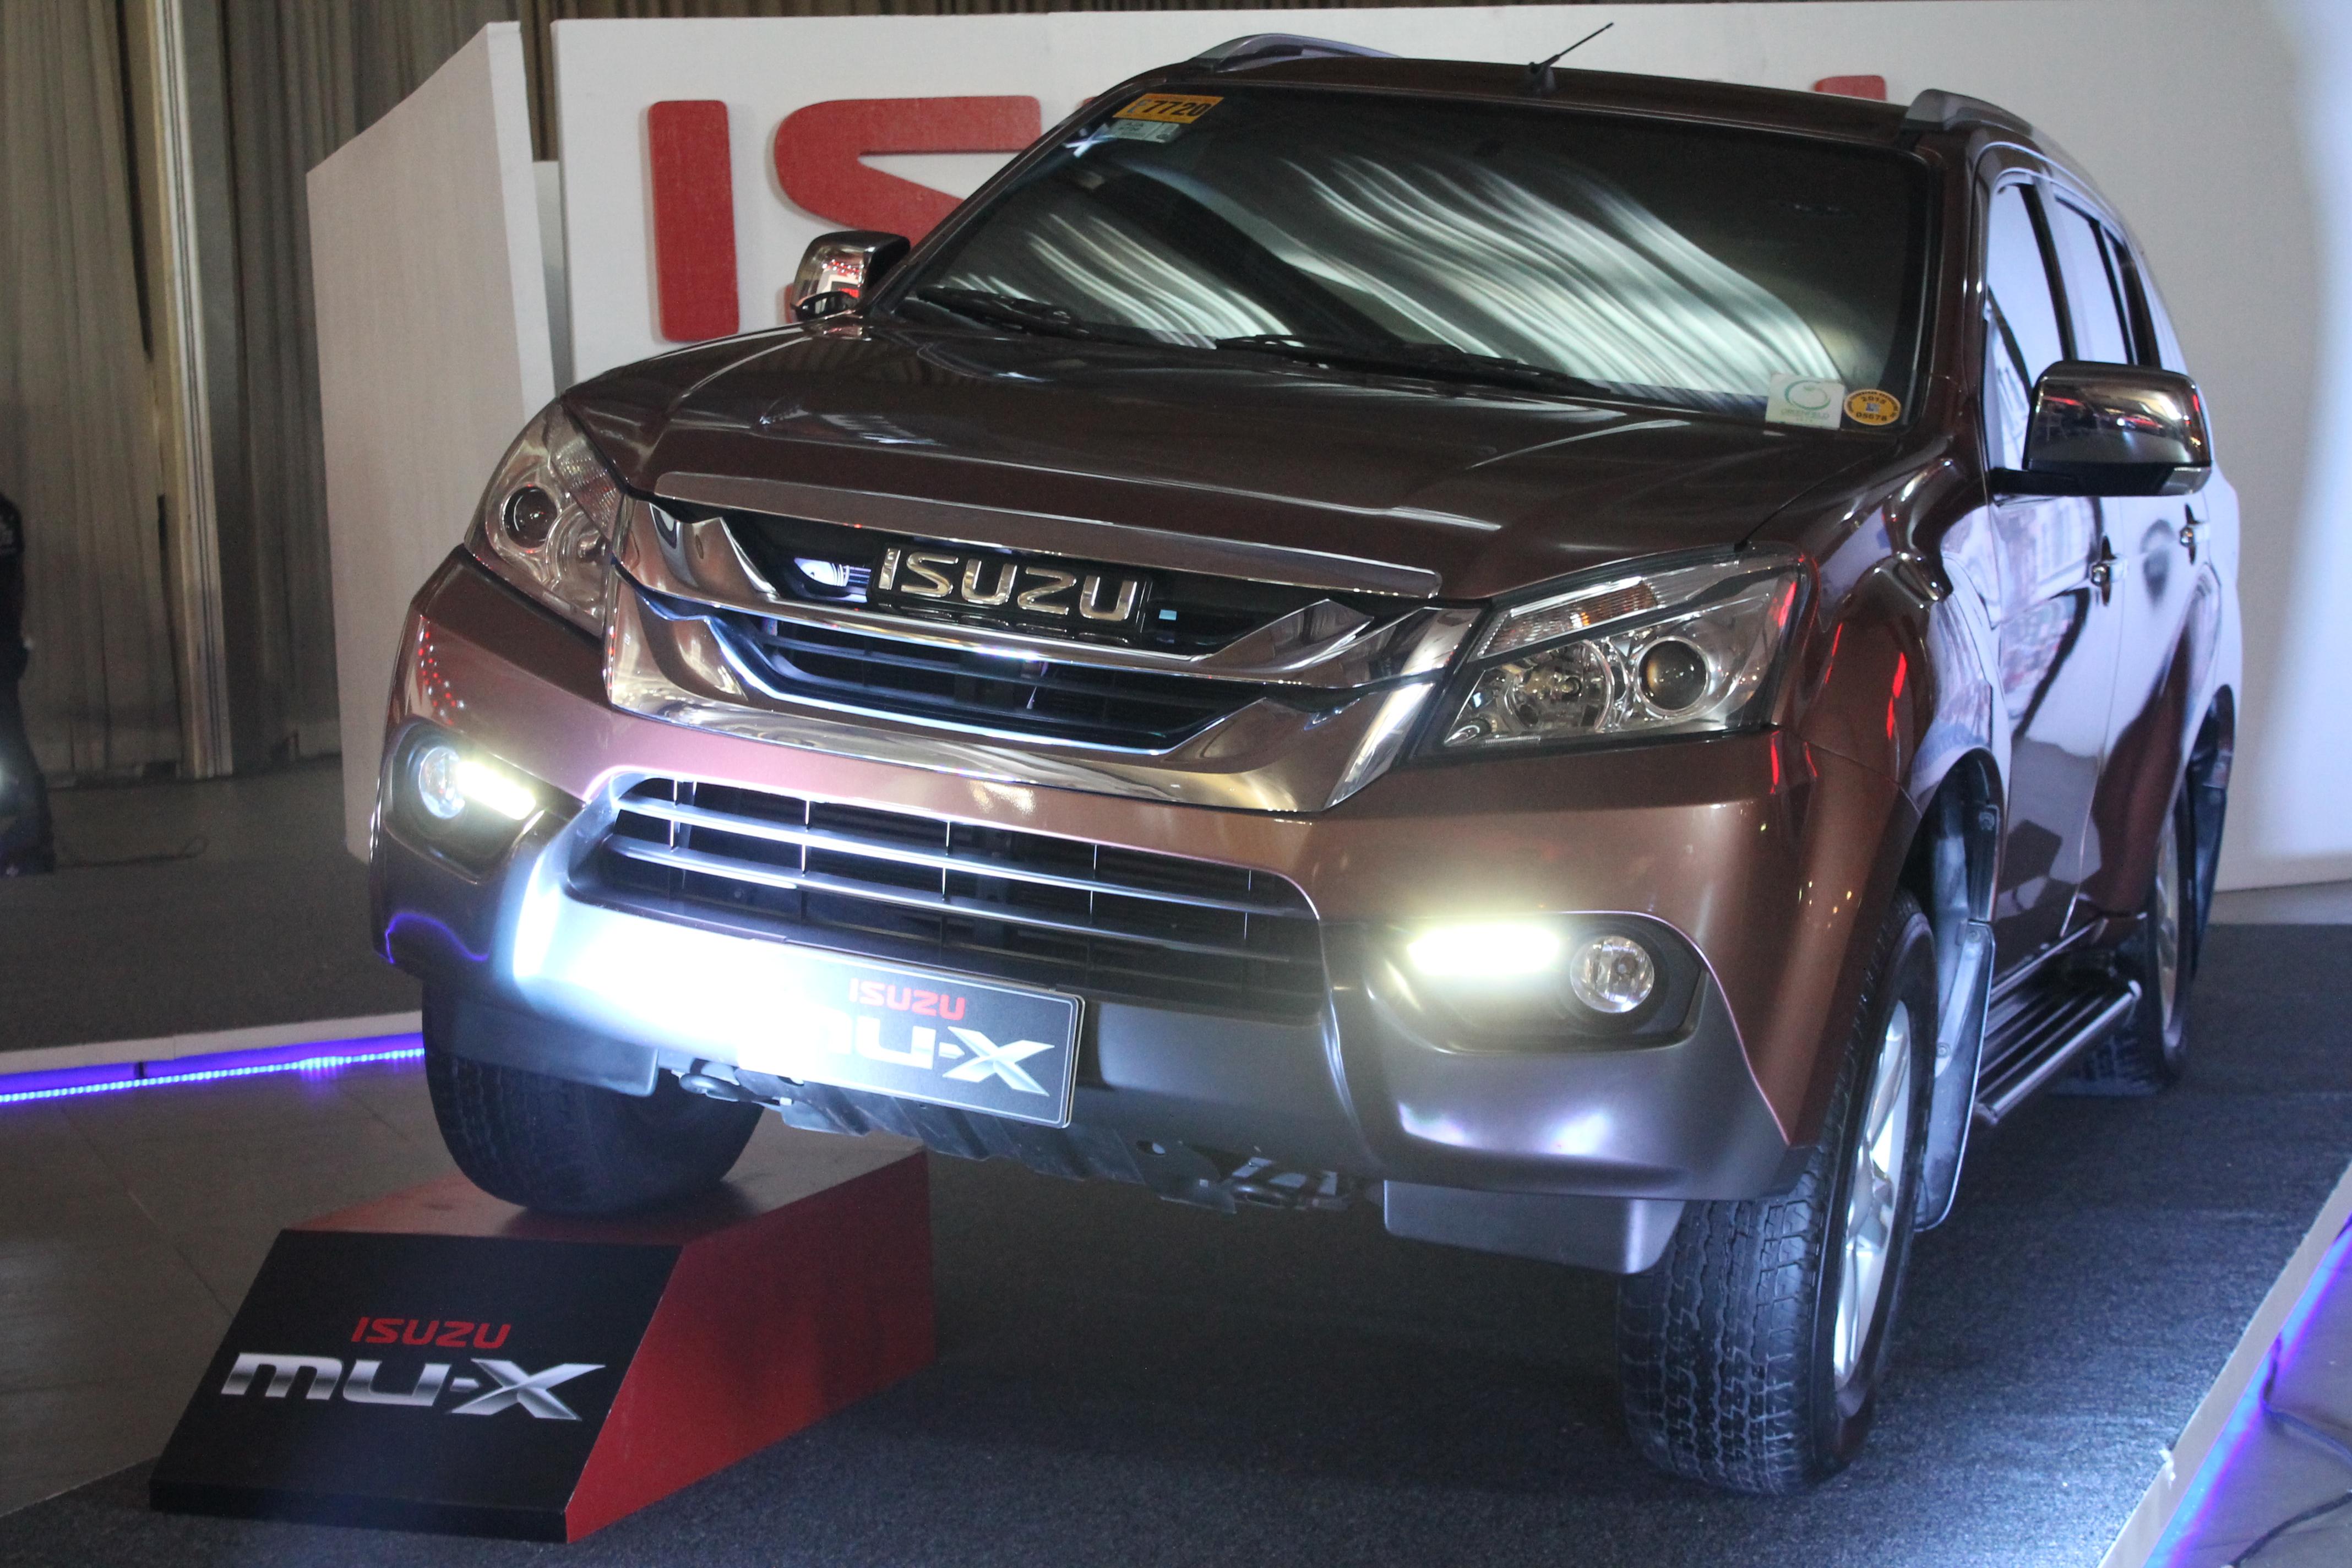 Powerful driving performance by new Isuzu 3 0 VGS Turbo